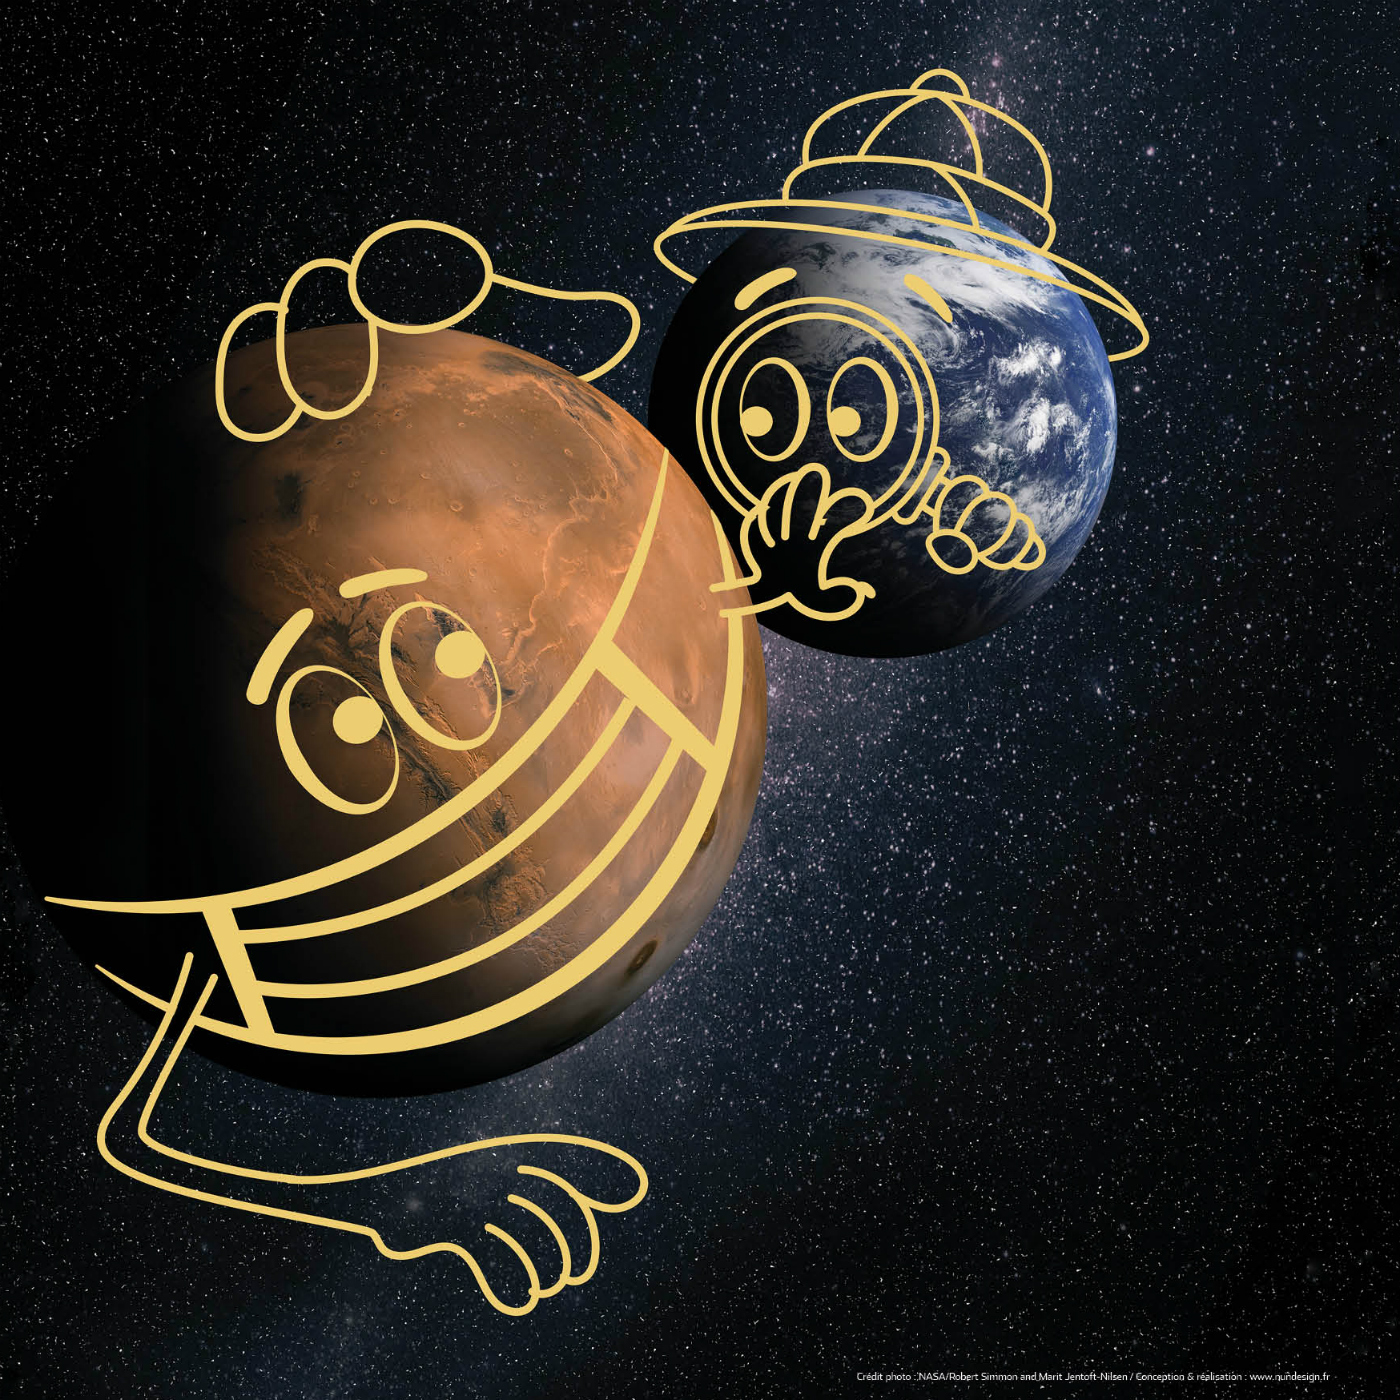 is-mardis-espace-24mai2016.jpg